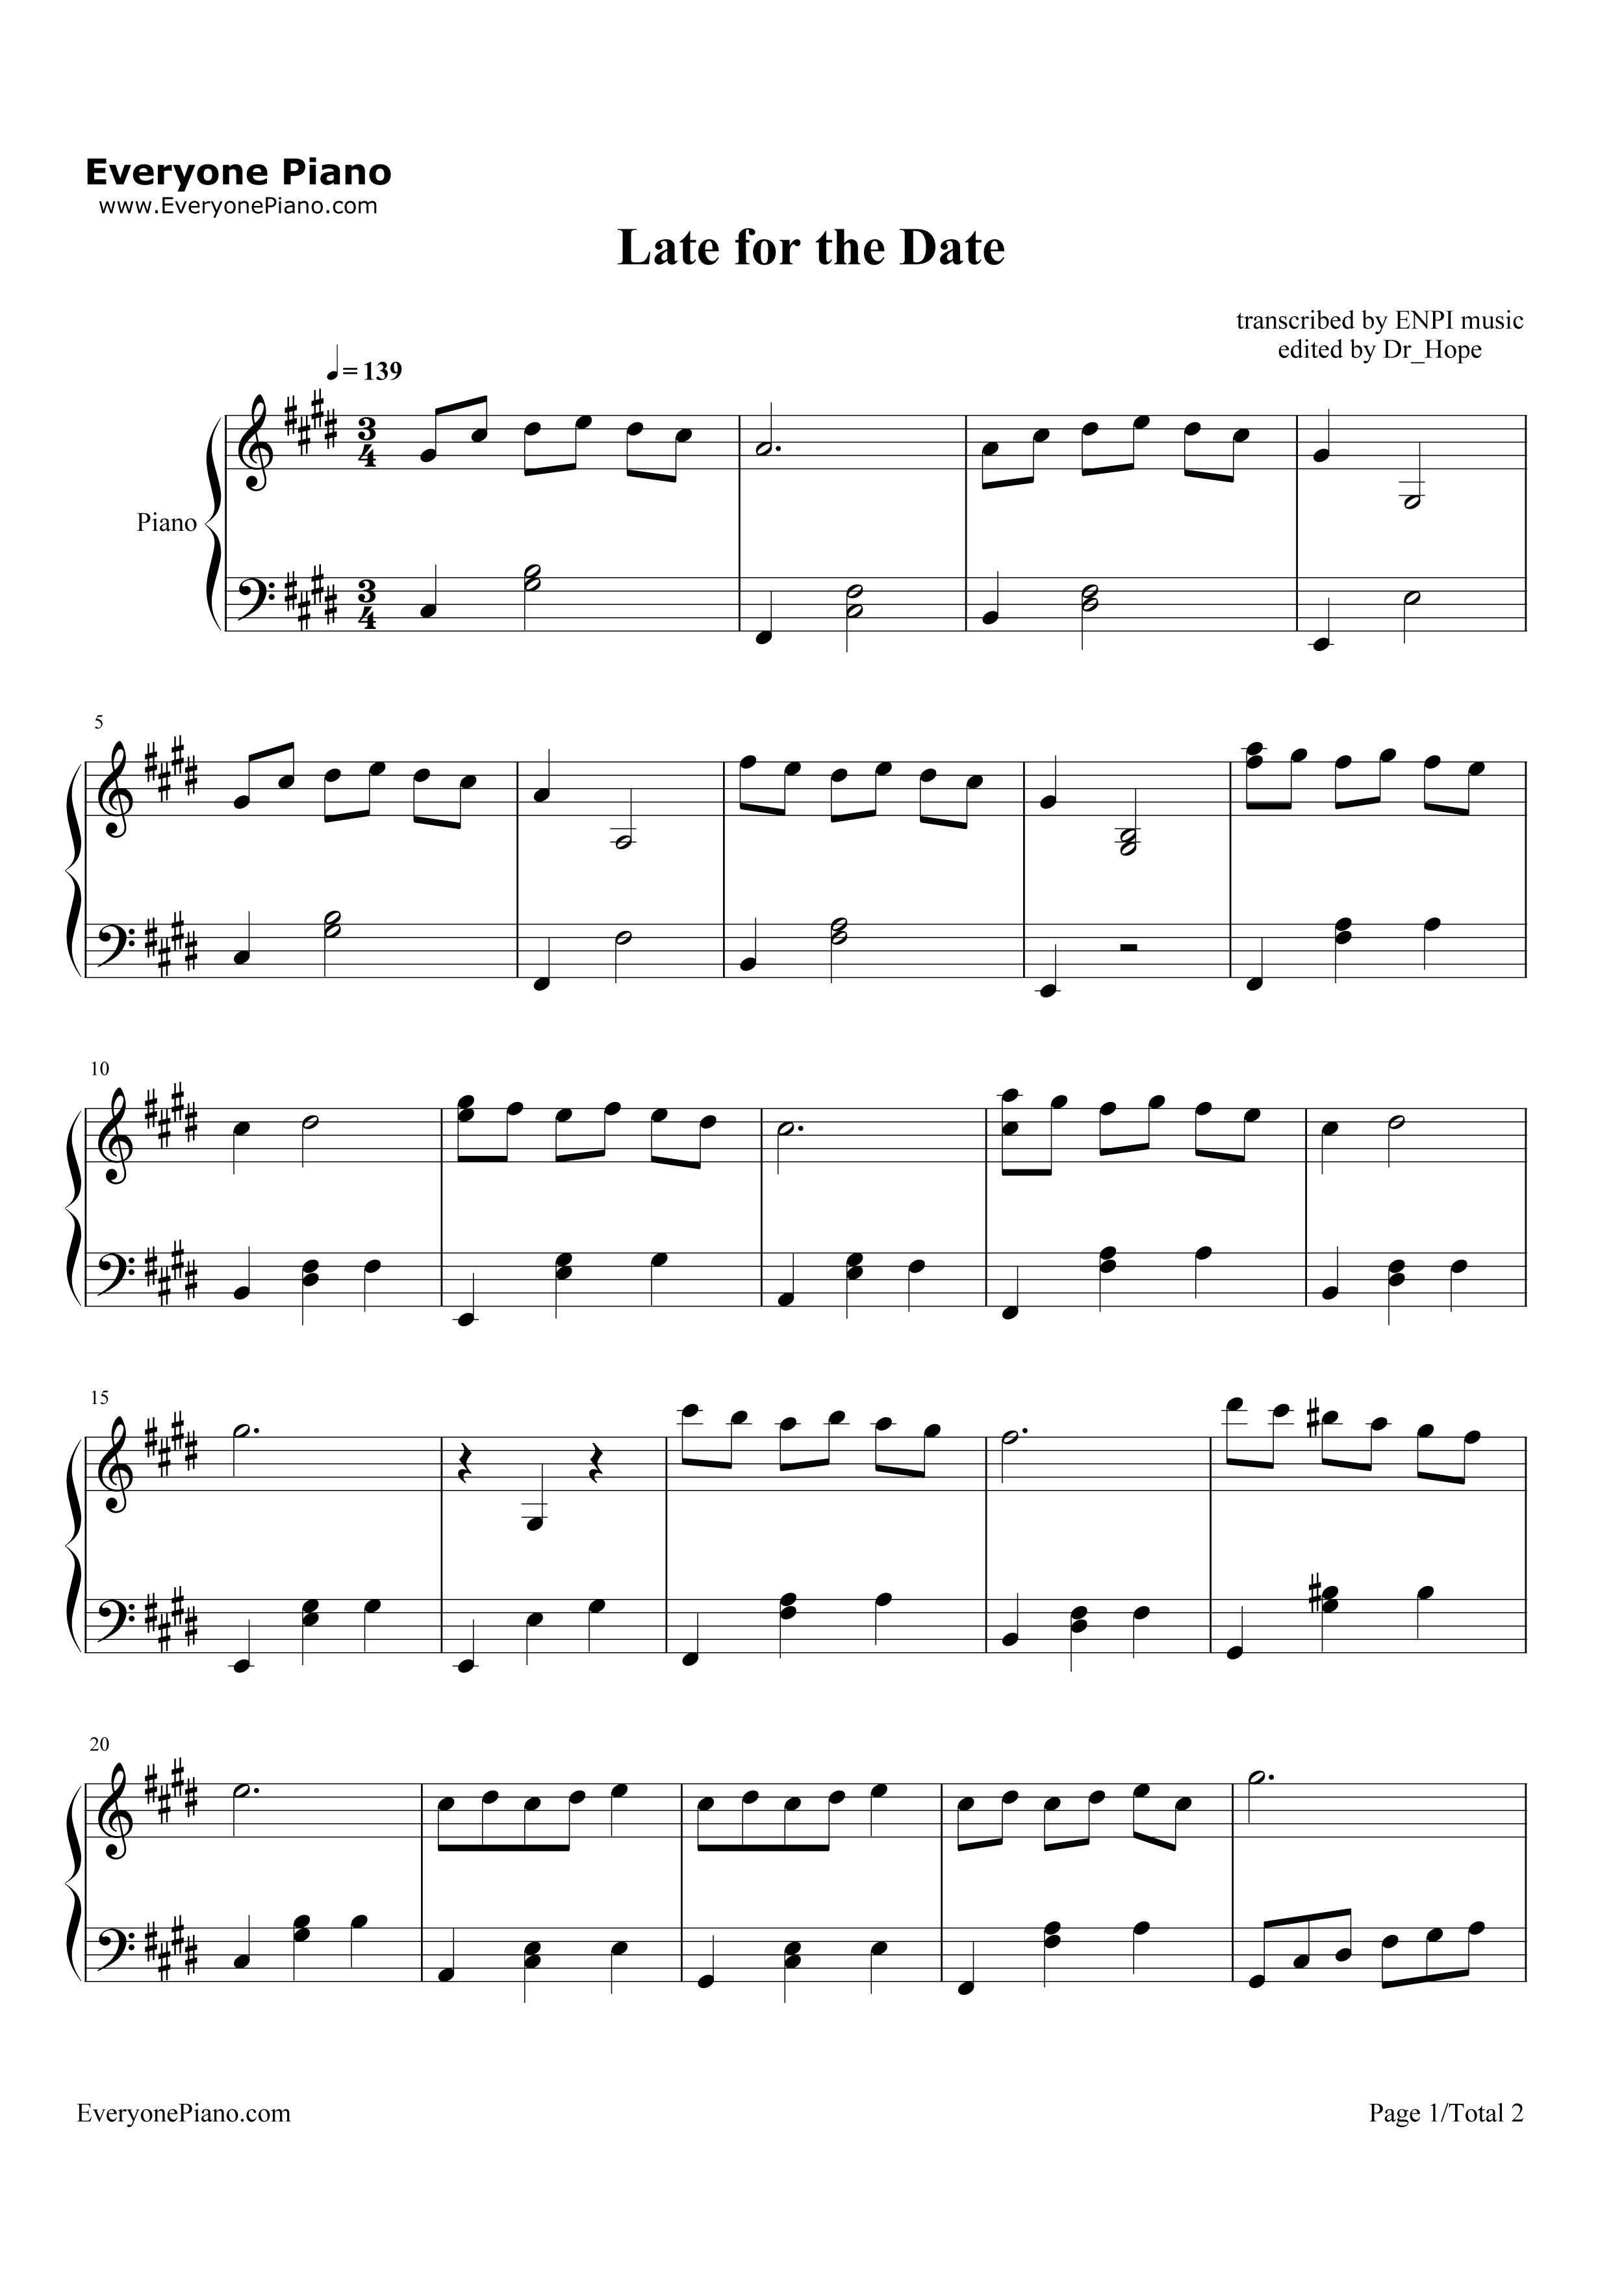 mia and sebastian's theme piano pdf free